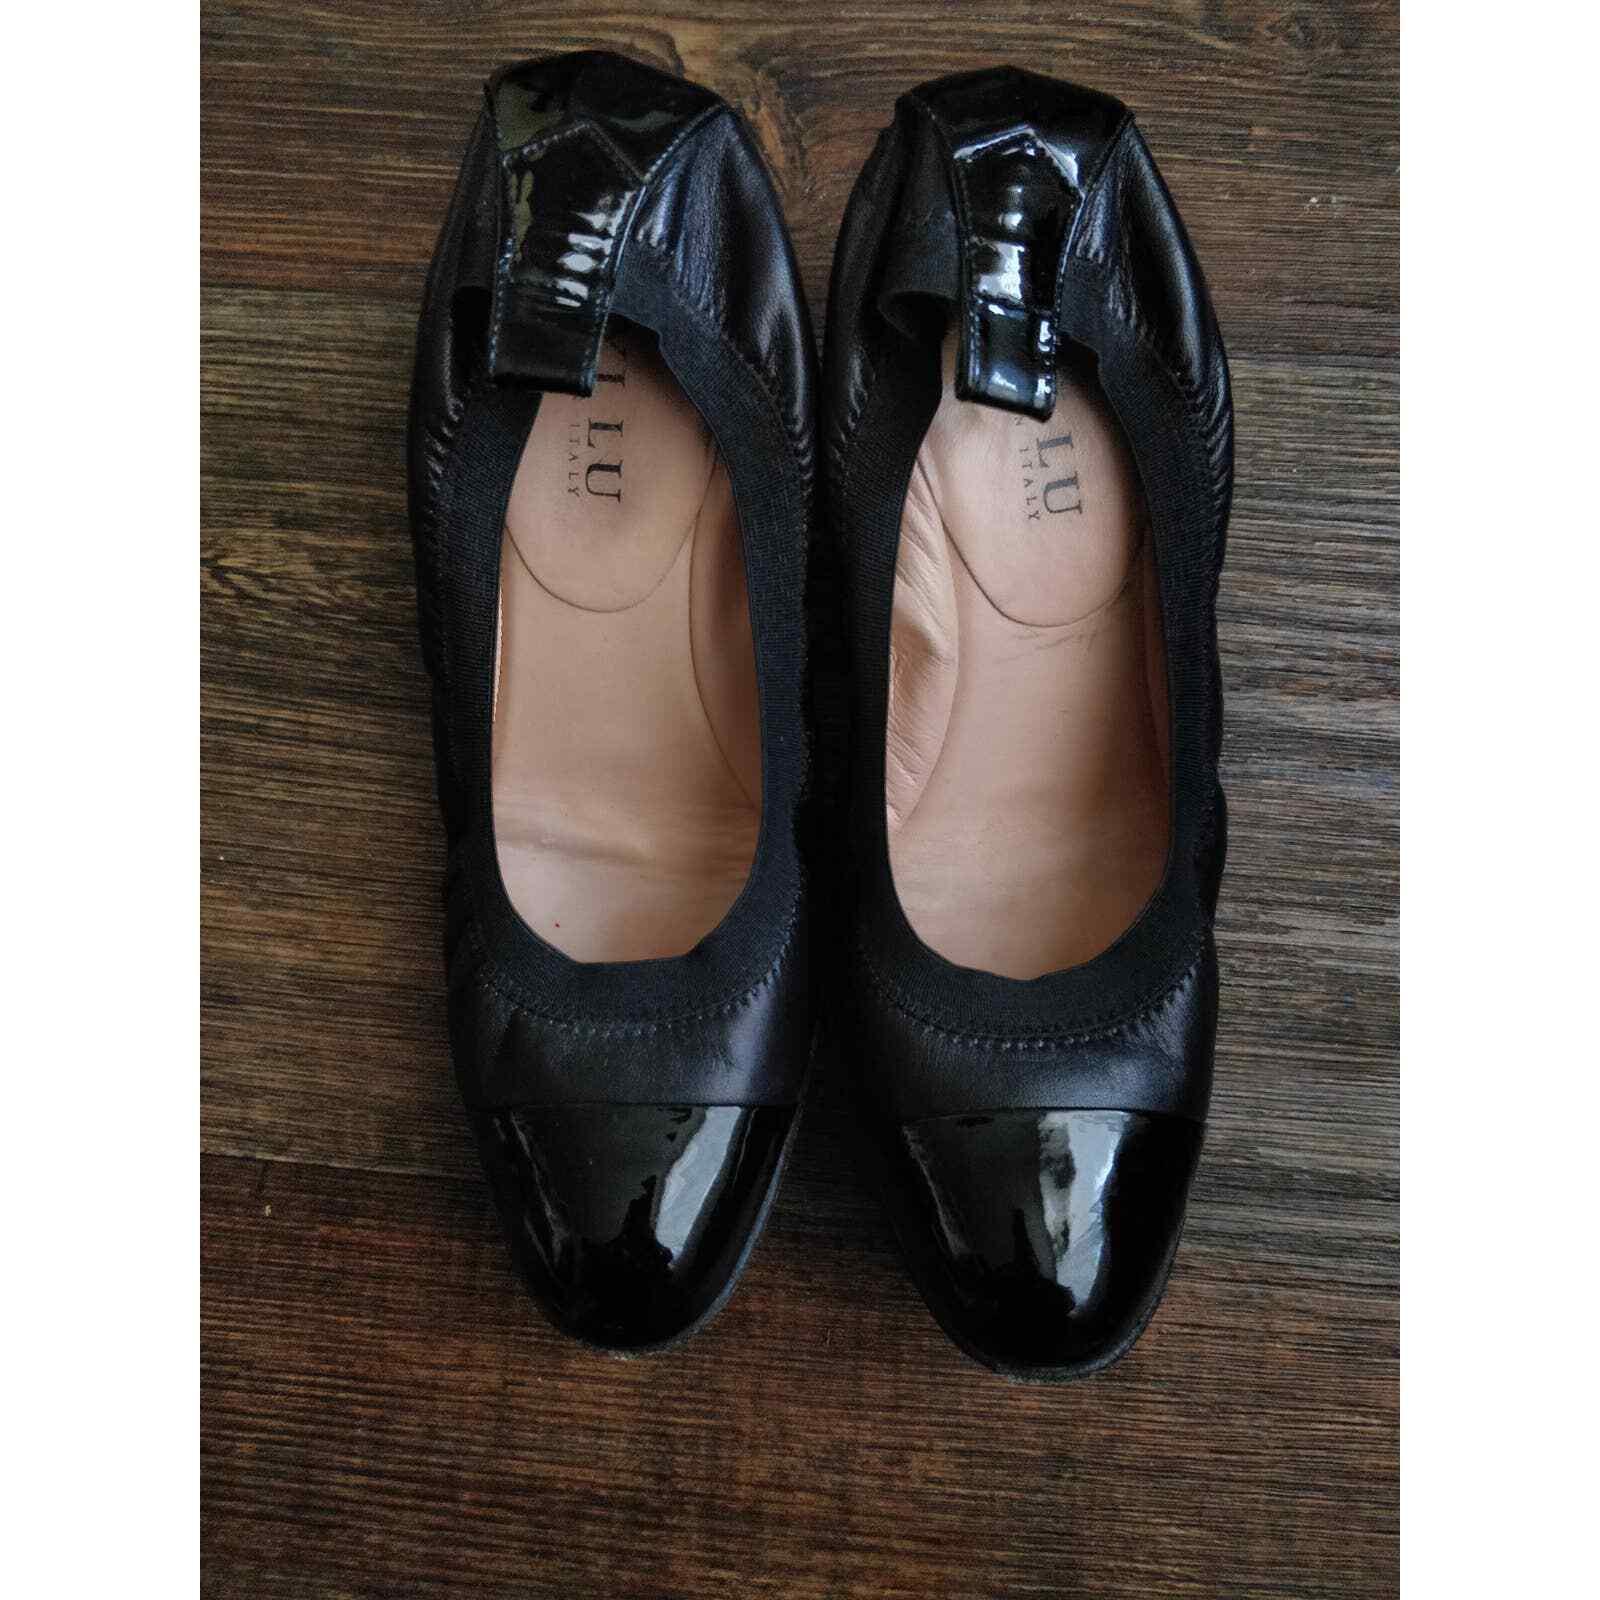 Anyi Lu Italian Paige Black Leather Heeled Ballet Shoes Women's Size 38